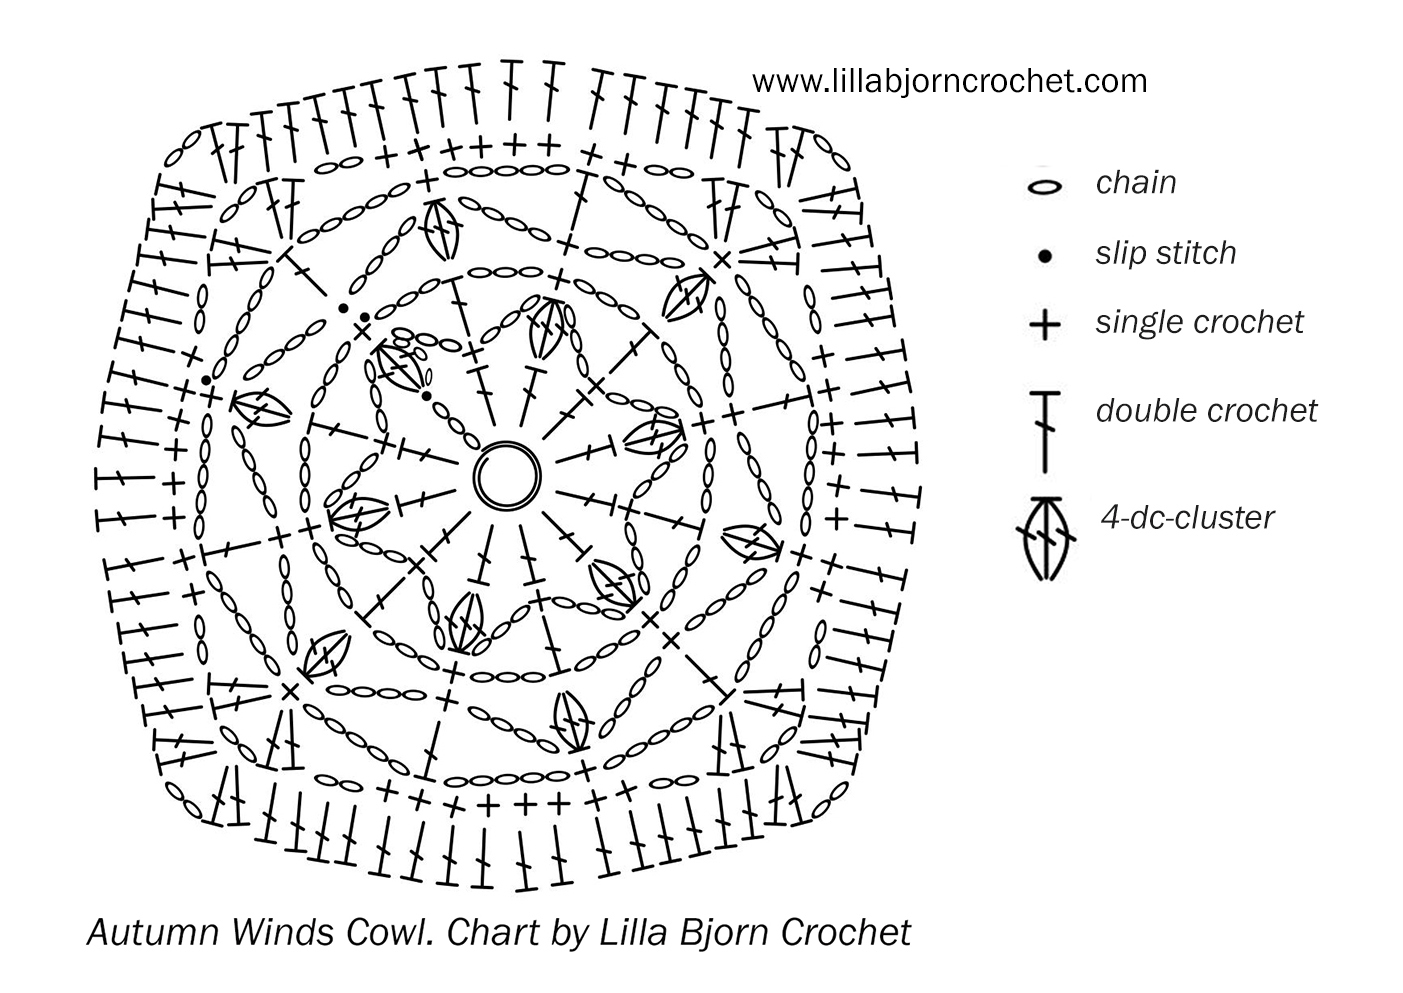 Autumn Winds Cowl Free Crochet Pattern